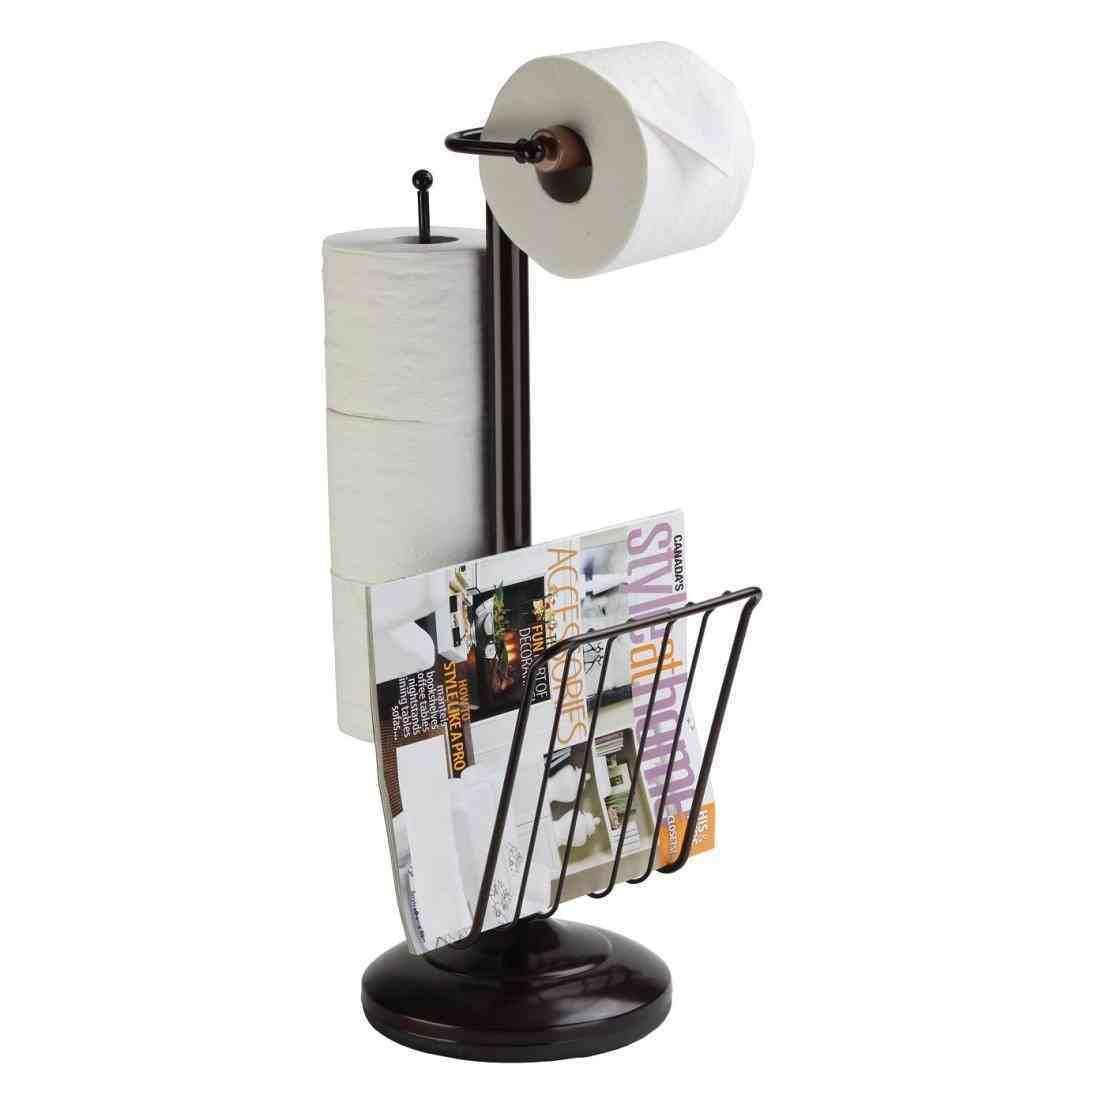 New Post Bathroom Toilet Paper Holder Free Standing